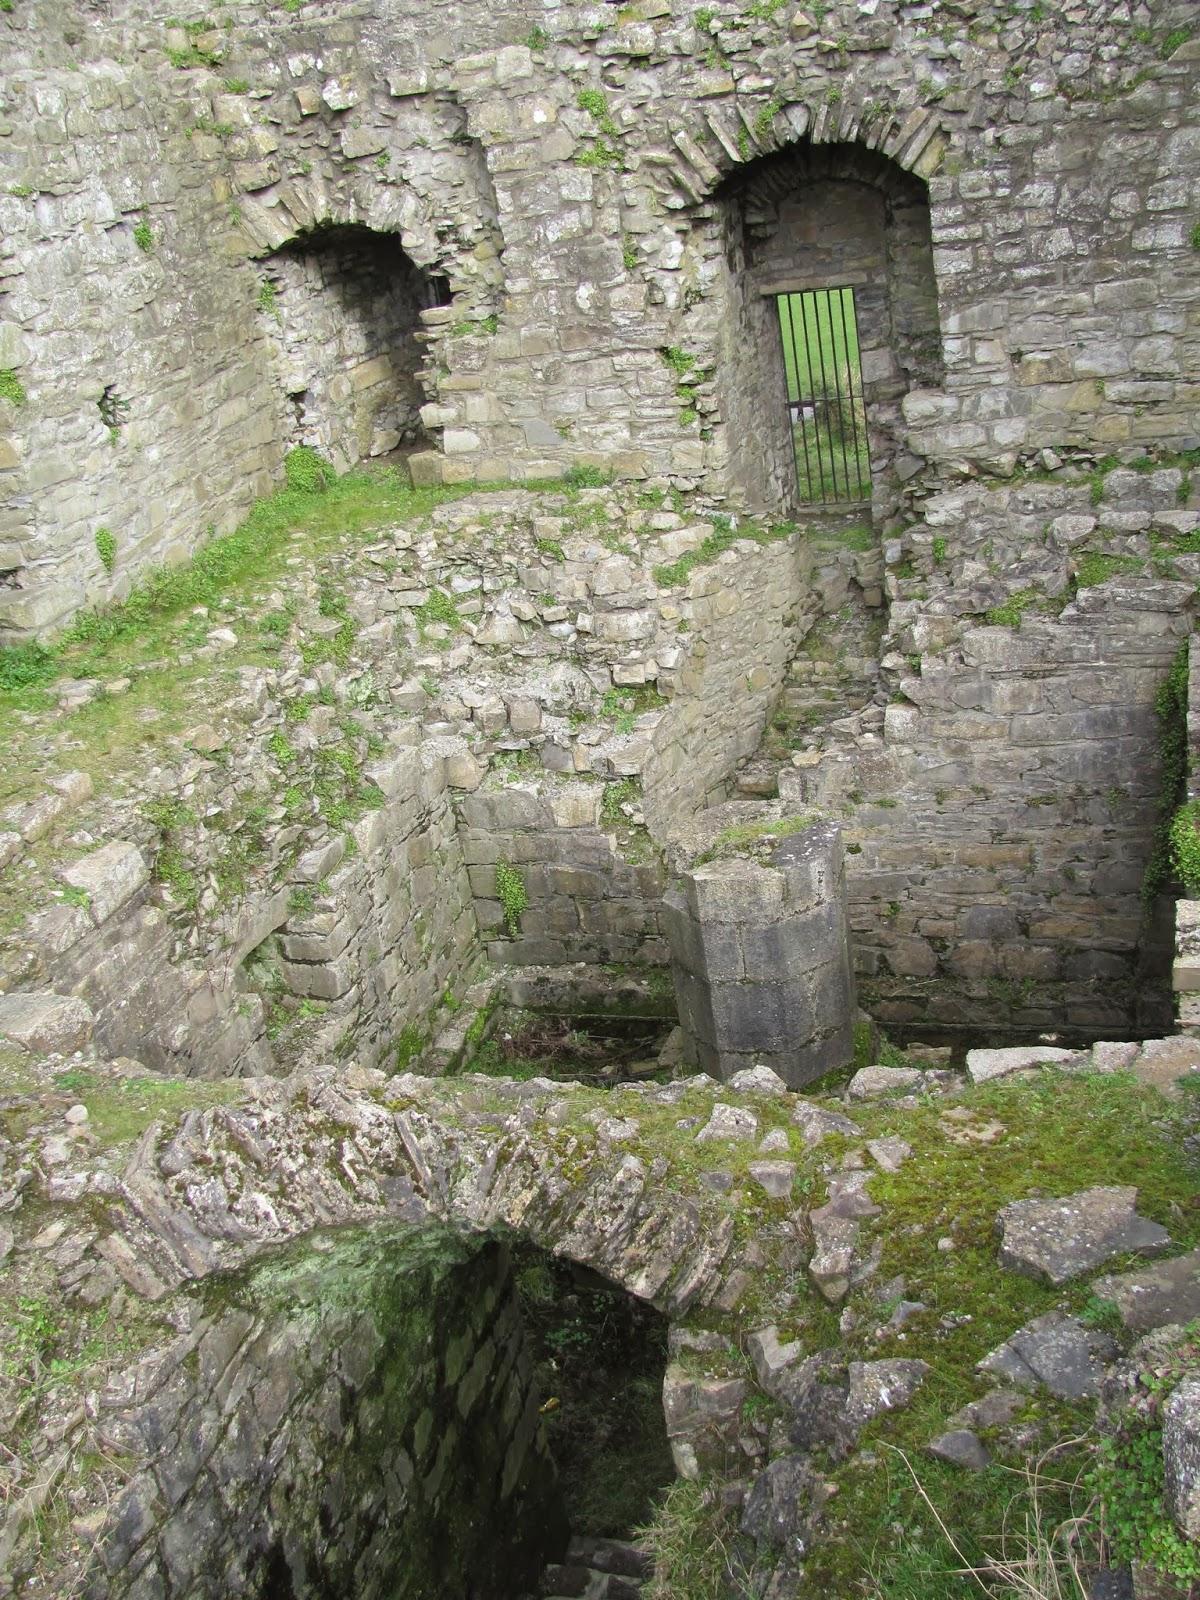 Below the Great Hall of Trim Castle in Trim, Ireland